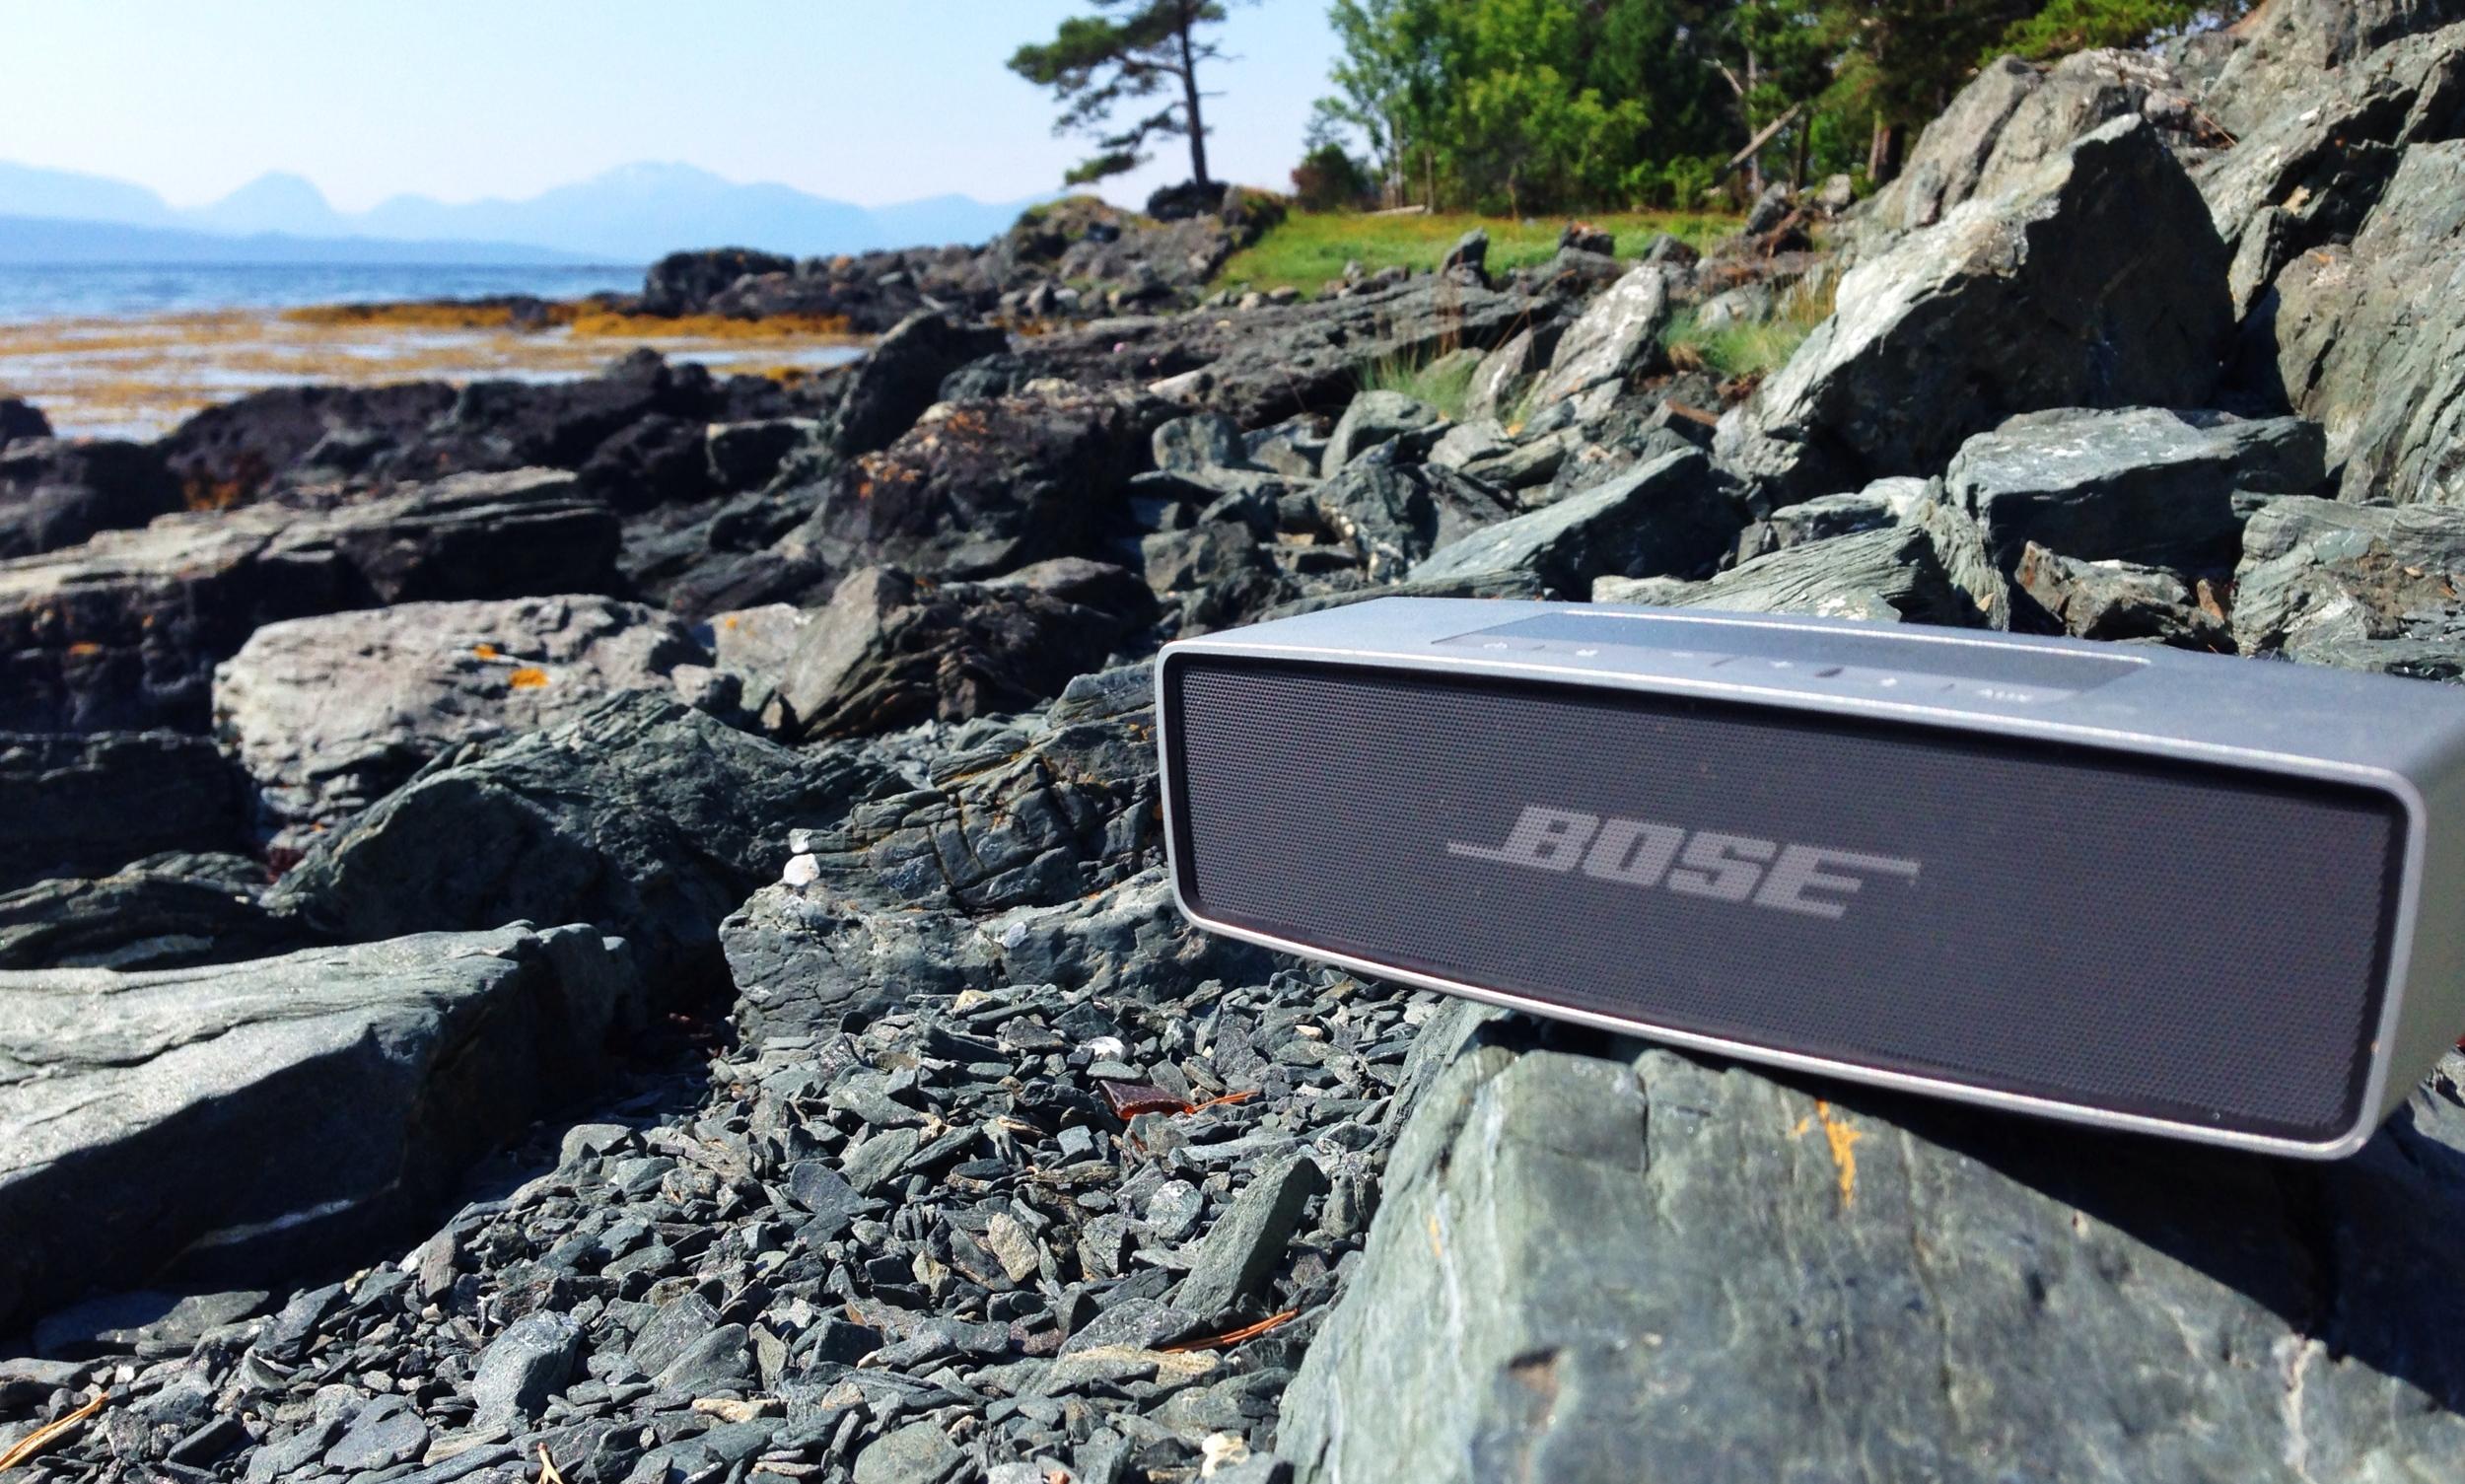 Bose Soundlink Mini er testet i flere måneder. Resultatet er svært oppløftende. Dette kan bli årets julegave til en du er glad i - eller selvsagt til deg selv.  Foto: Odd Roar Lange